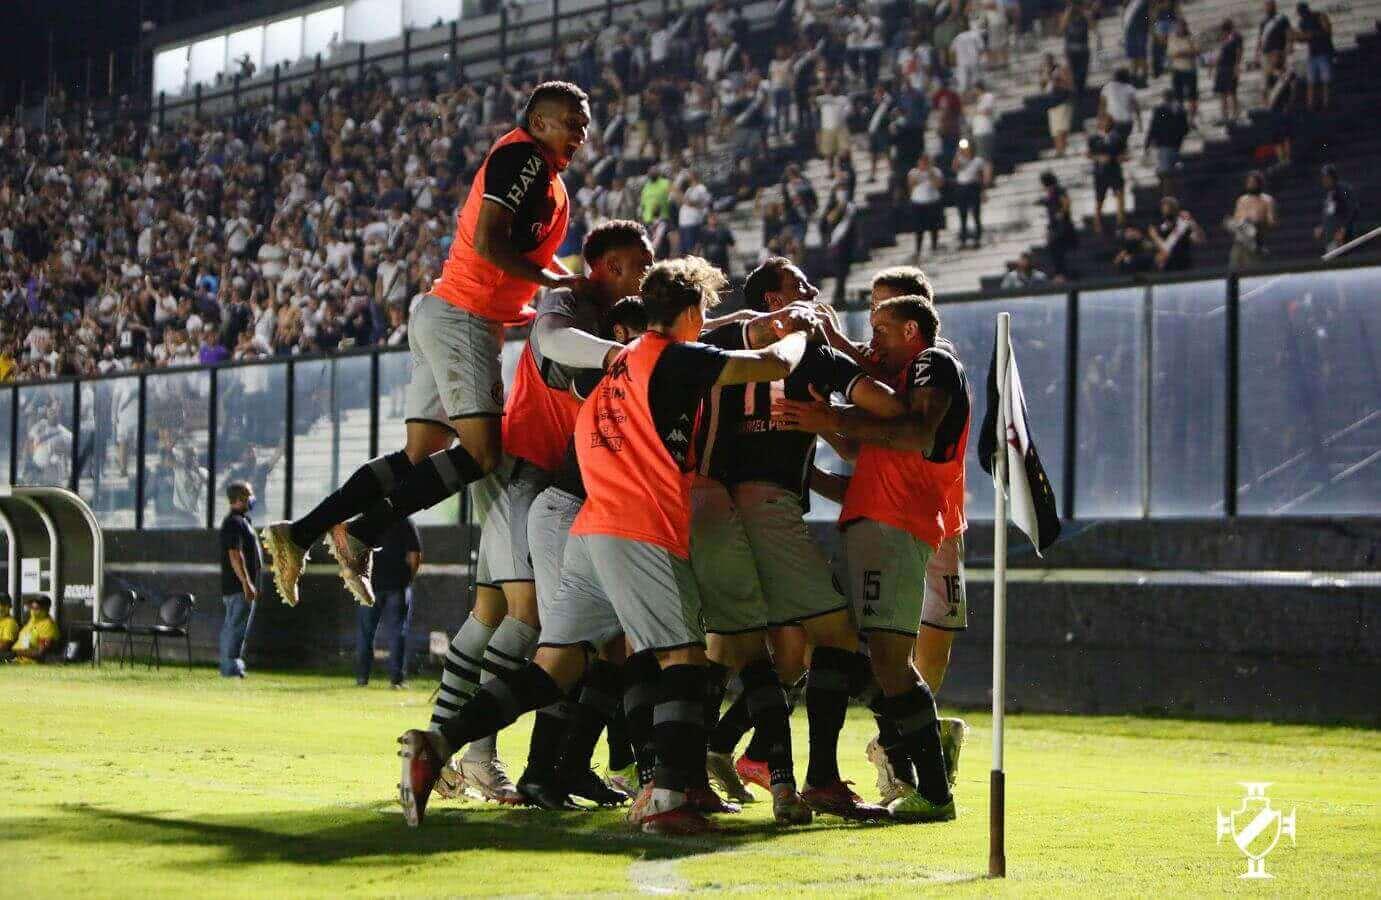 Jogadores comemorando gol contra o Goiás